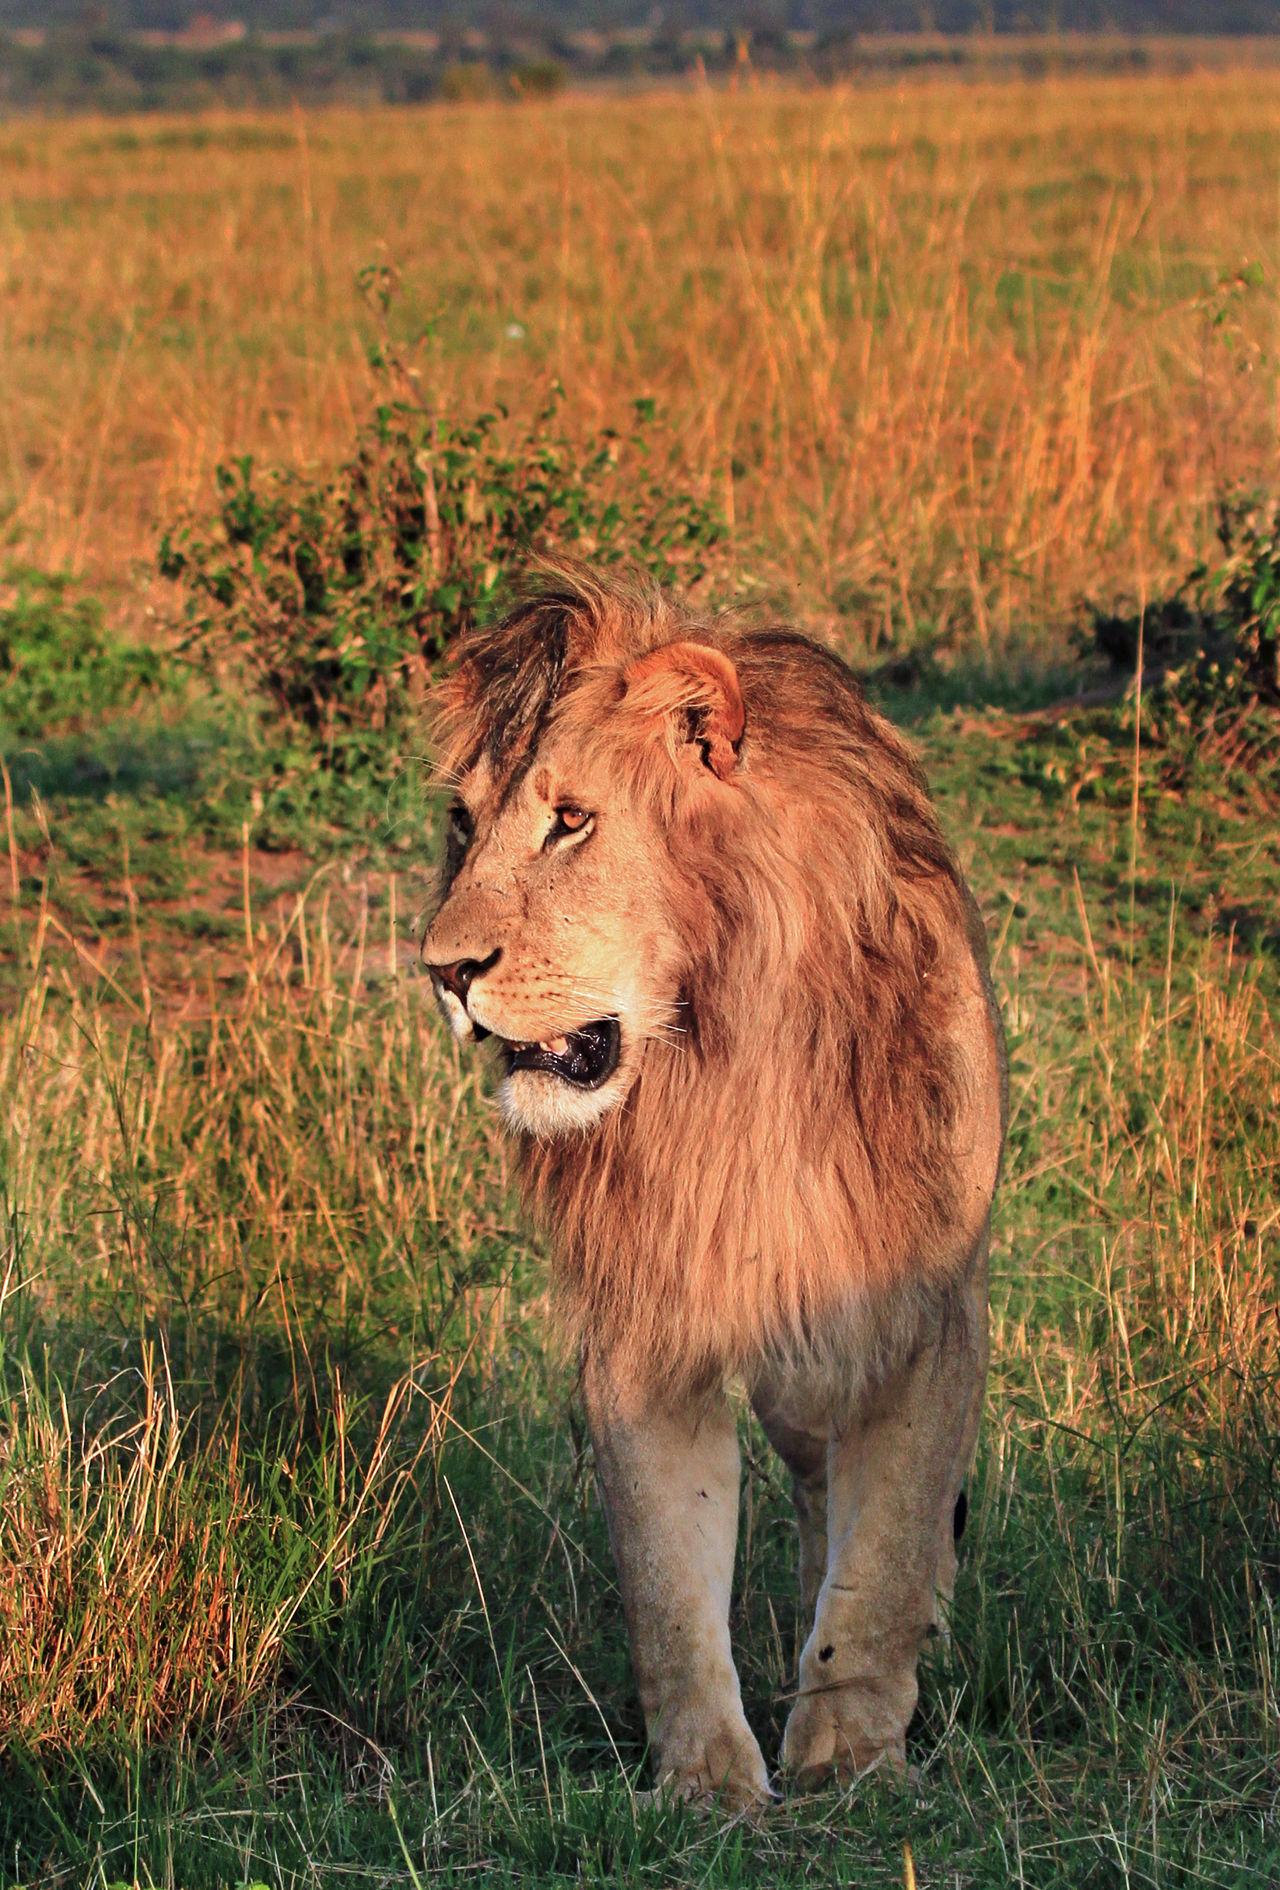 Animal Themes Animal Wildlife Animals In The Wild Beauty In Nature Big Cat Big Five Golden Mane Grass Kenya Lion Mammal Masai Mara National Park Nature No People One Animal Outdoors Wildife Wildlife Photography